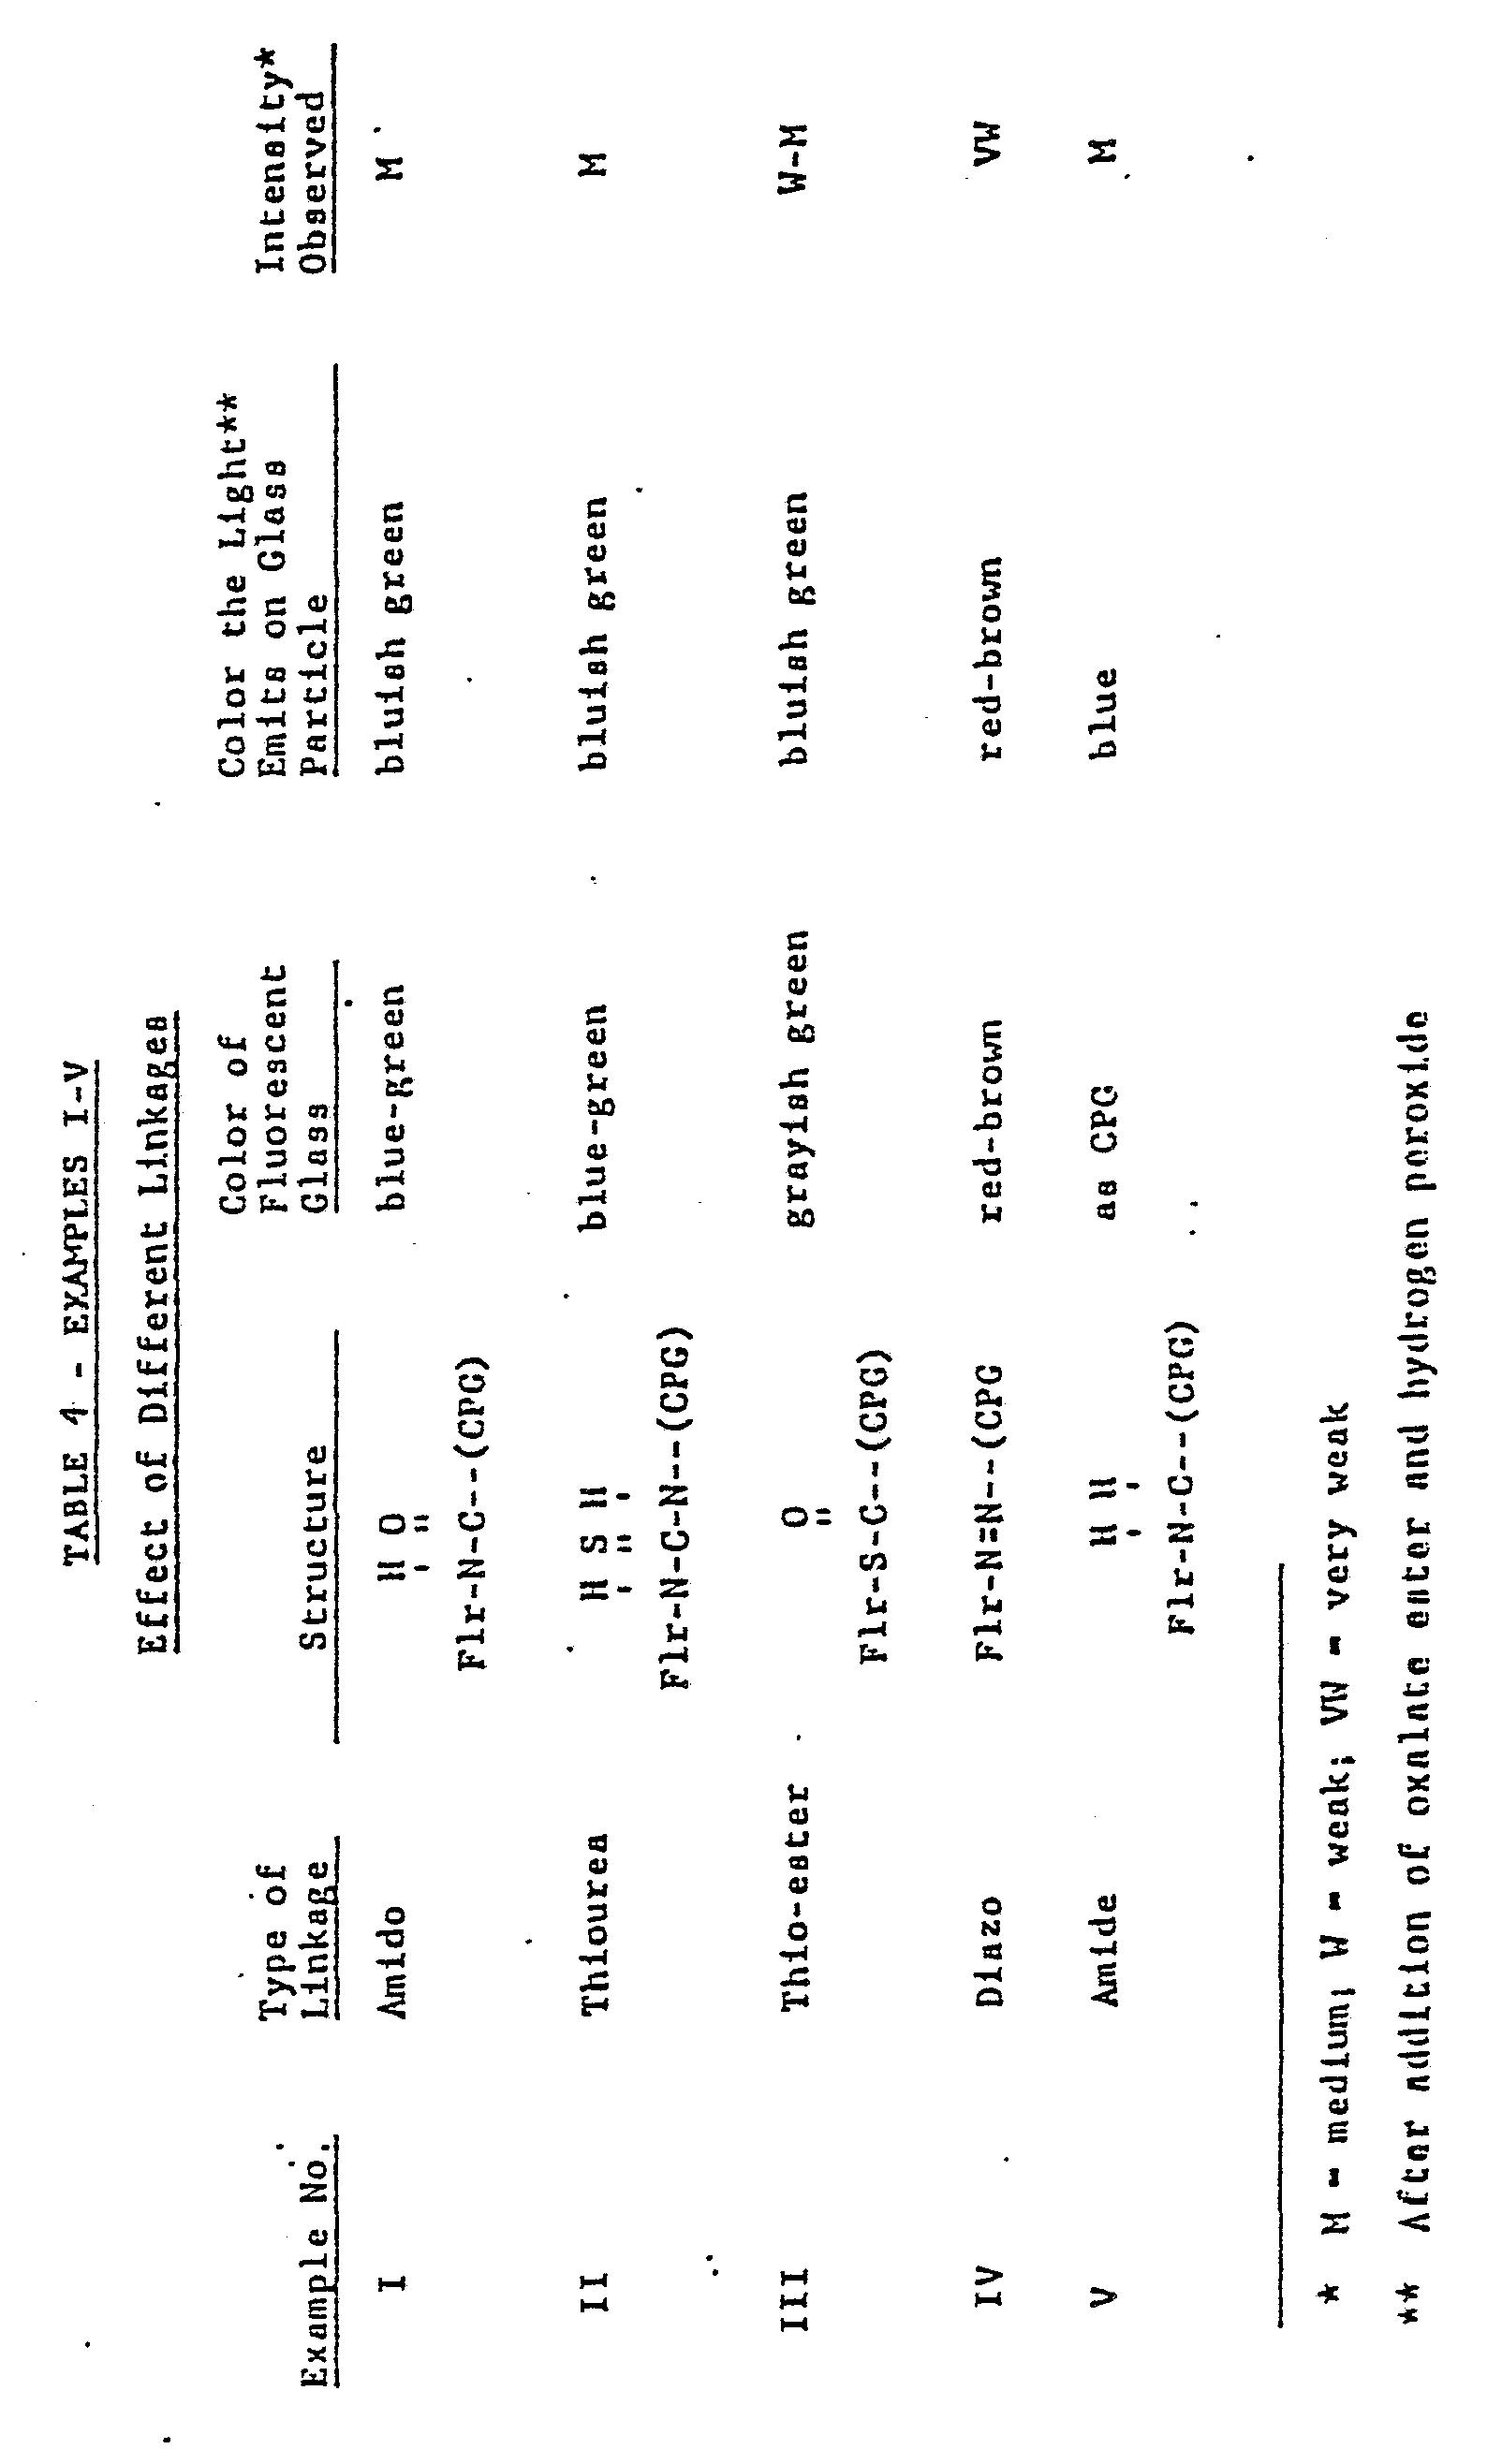 patent wo1982002772a1